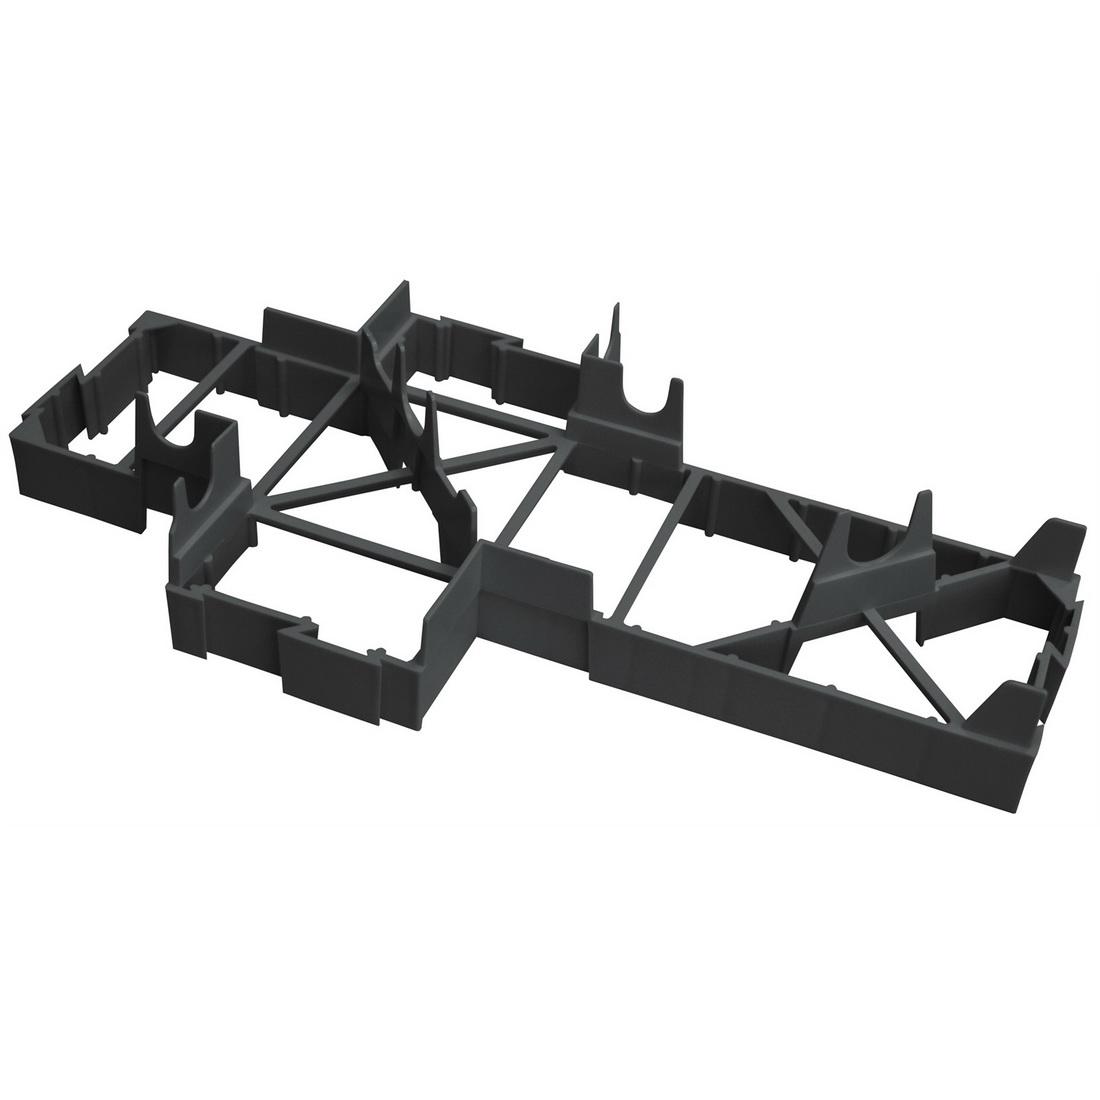 Expol Unimax Tuff Pod Spacer 50 x 200 x 400 mm Black FXEXPSPACERMAX